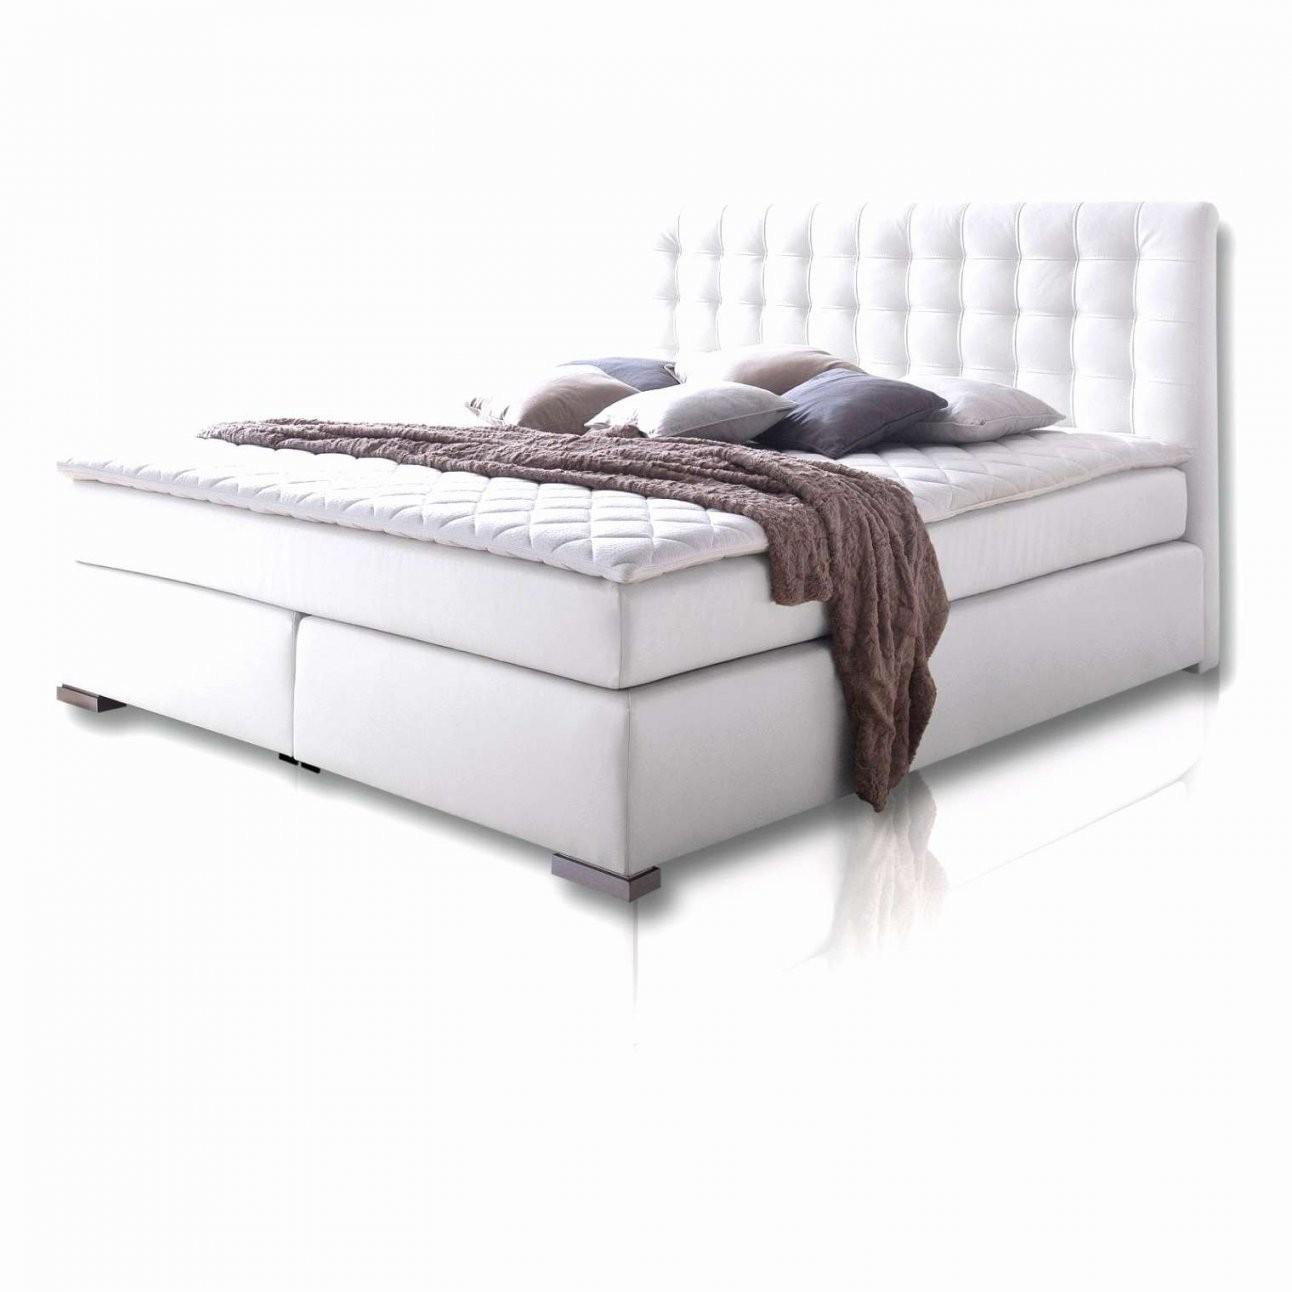 King Size Bett 200X200 Schön Bett 200—200 Interessant Beste Ideen von King Size Bett 200X200 Photo